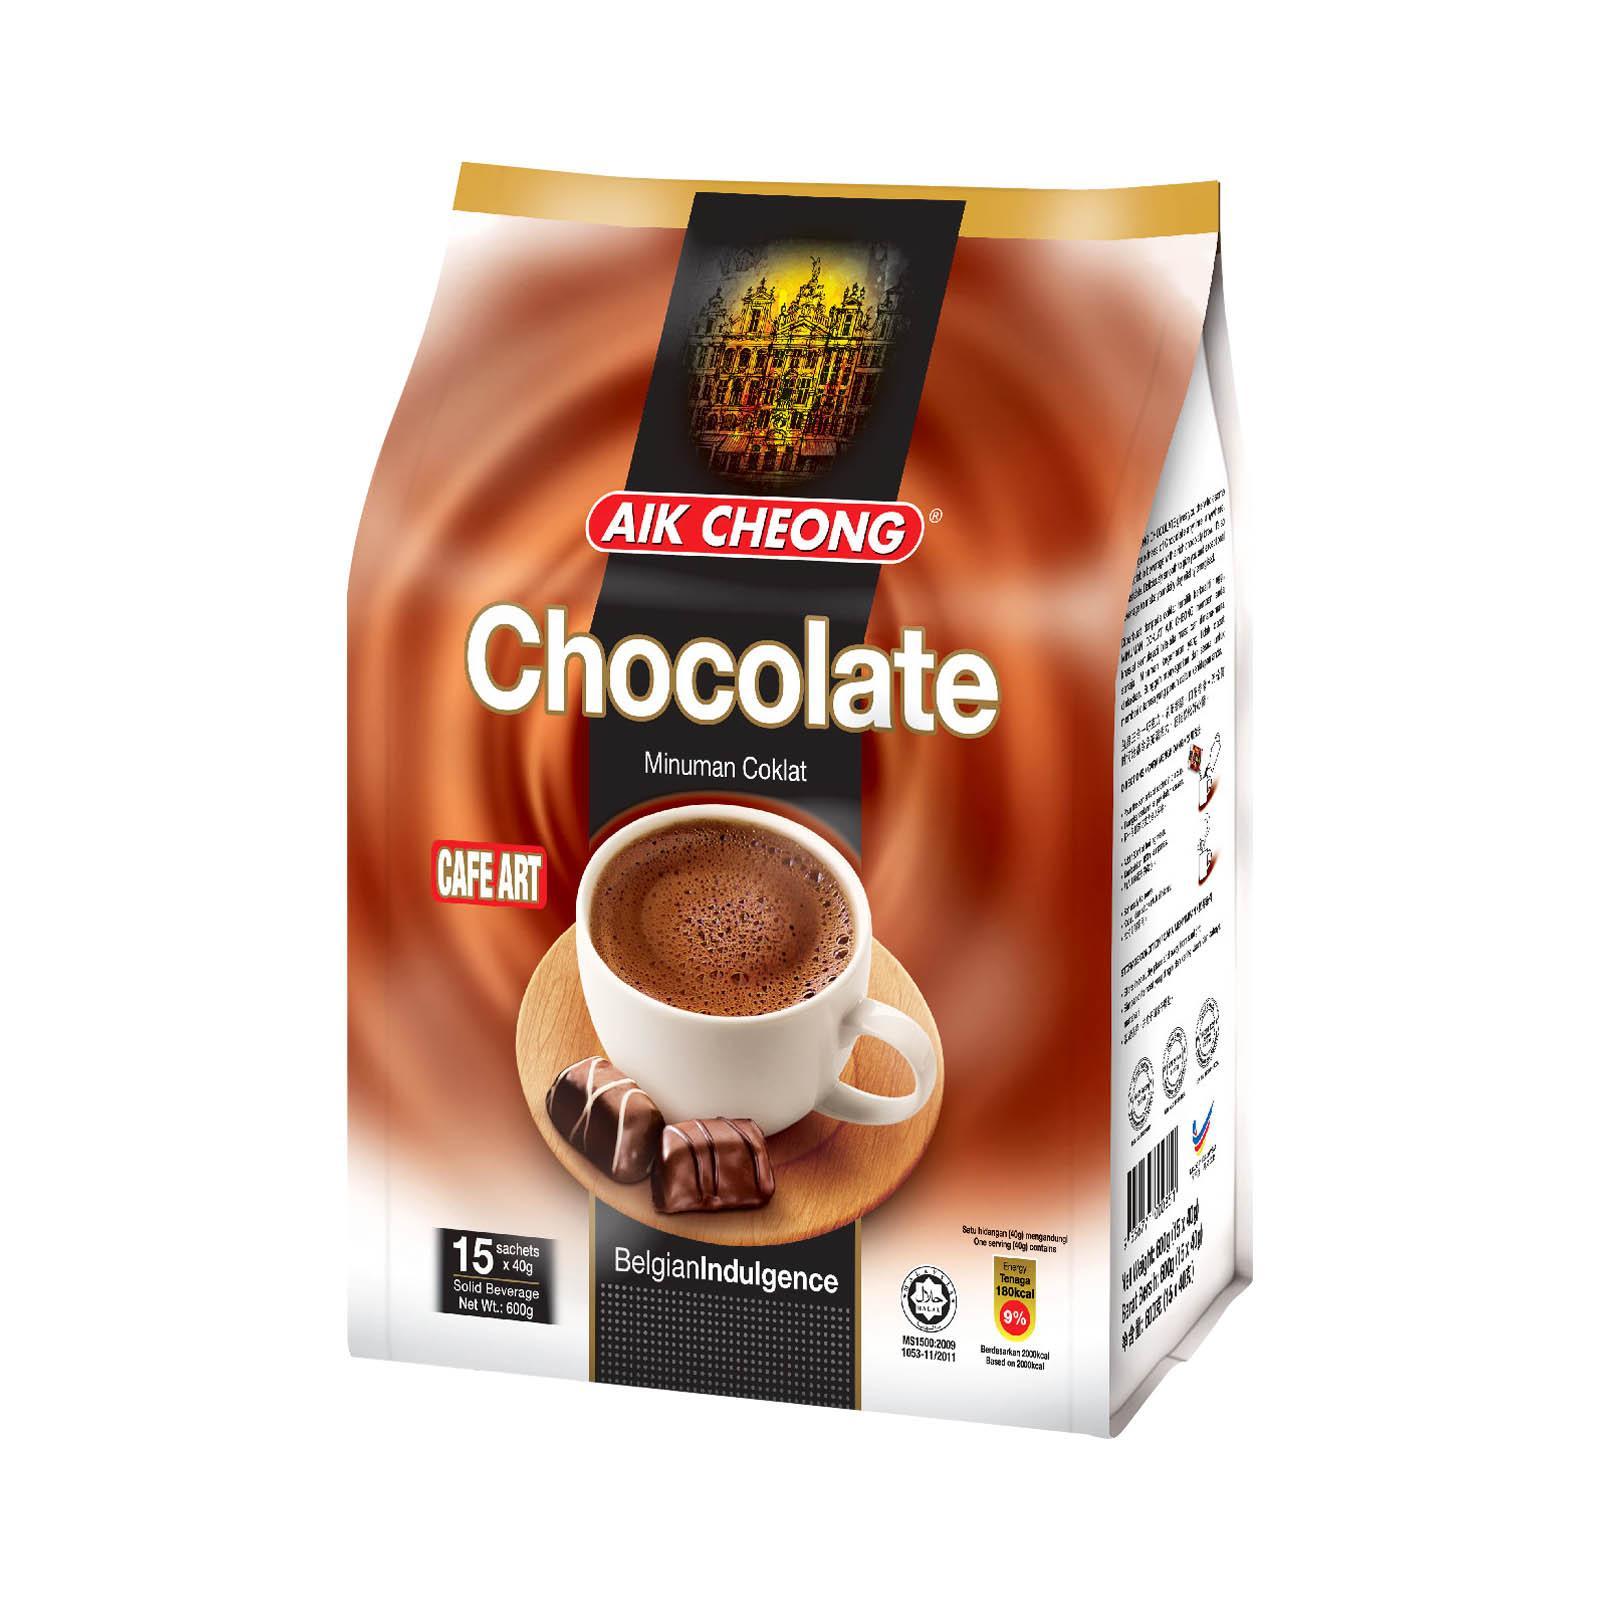 AIK CHEONG Chocolate